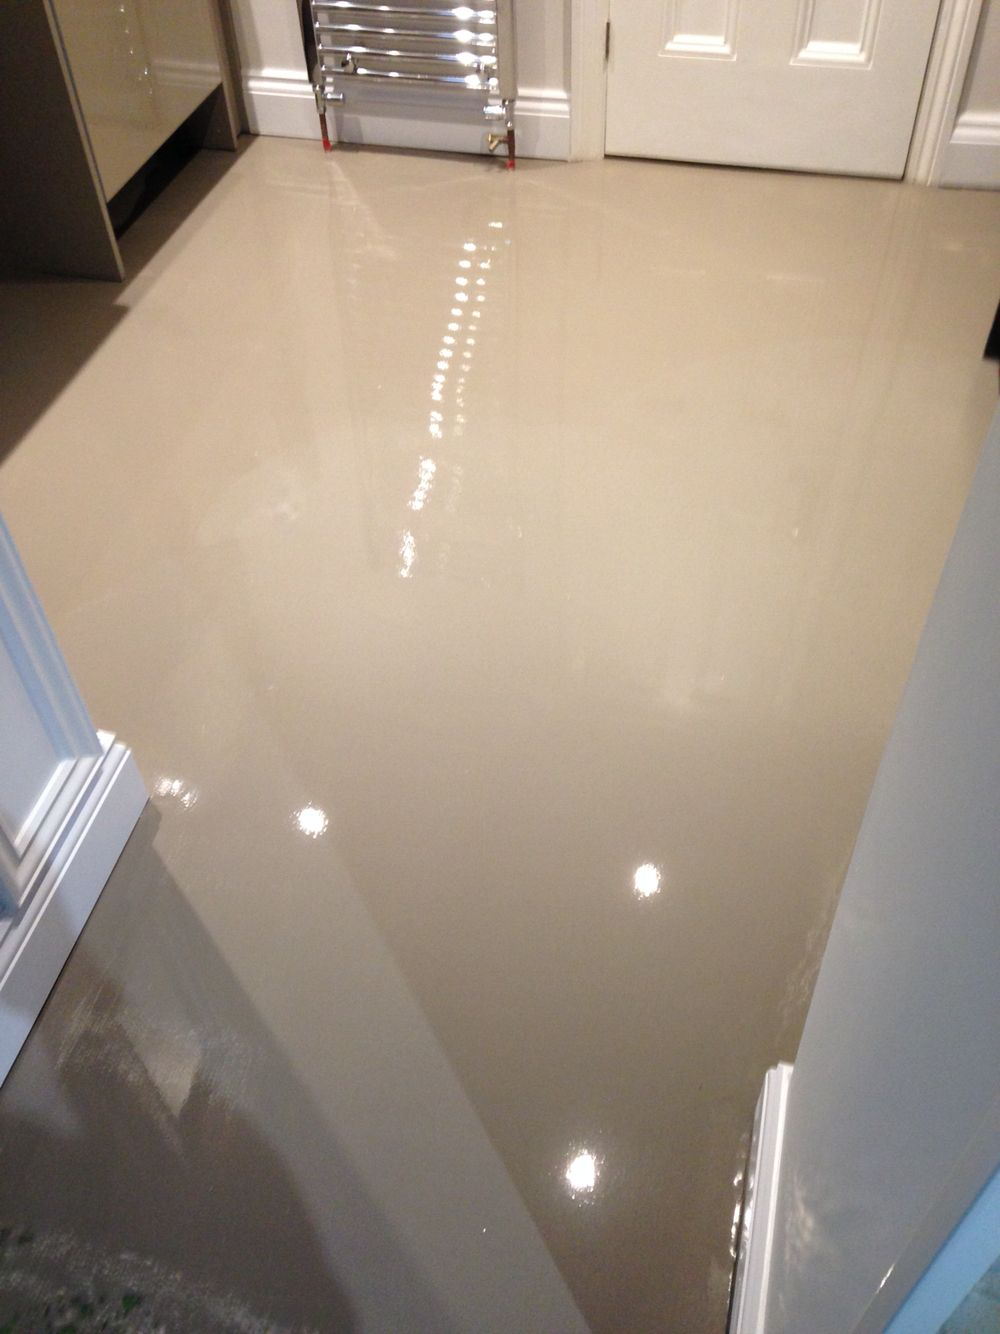 Screeding Bathroom Floor Fball 300hd Floor Screed Nearly Ready For Karndean Floor